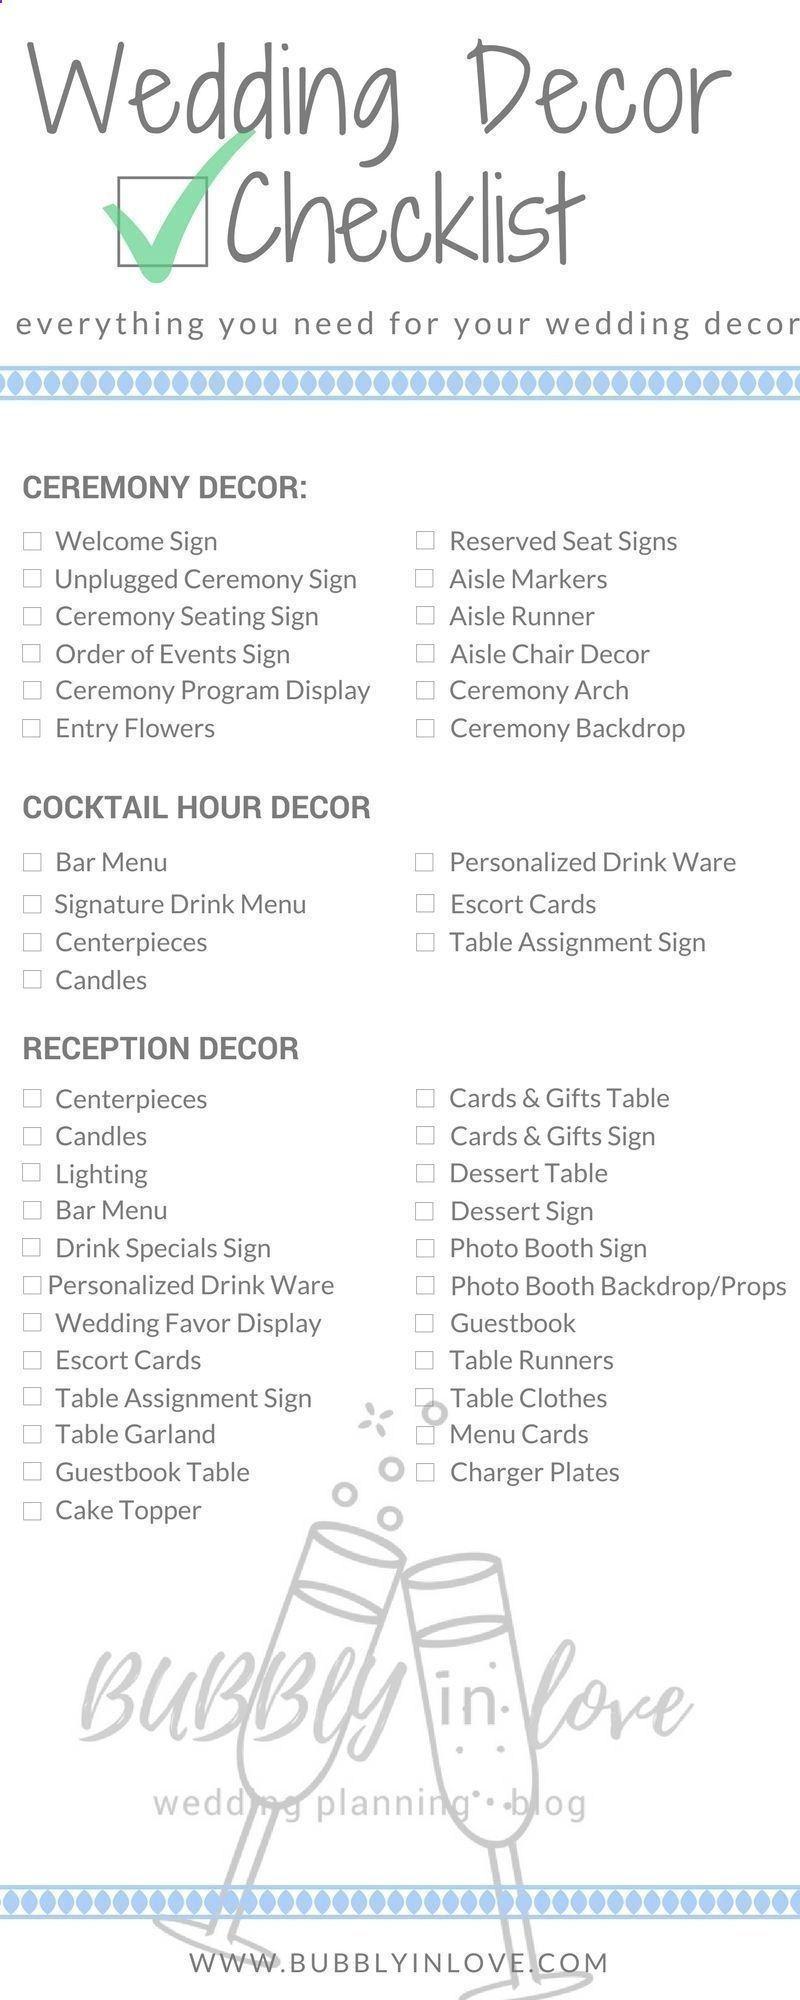 Wedding decor checklist wedding decor ceremony decor reception wedding decor checklist wedding decor ceremony decor reception decor cocktail hour decor junglespirit Gallery